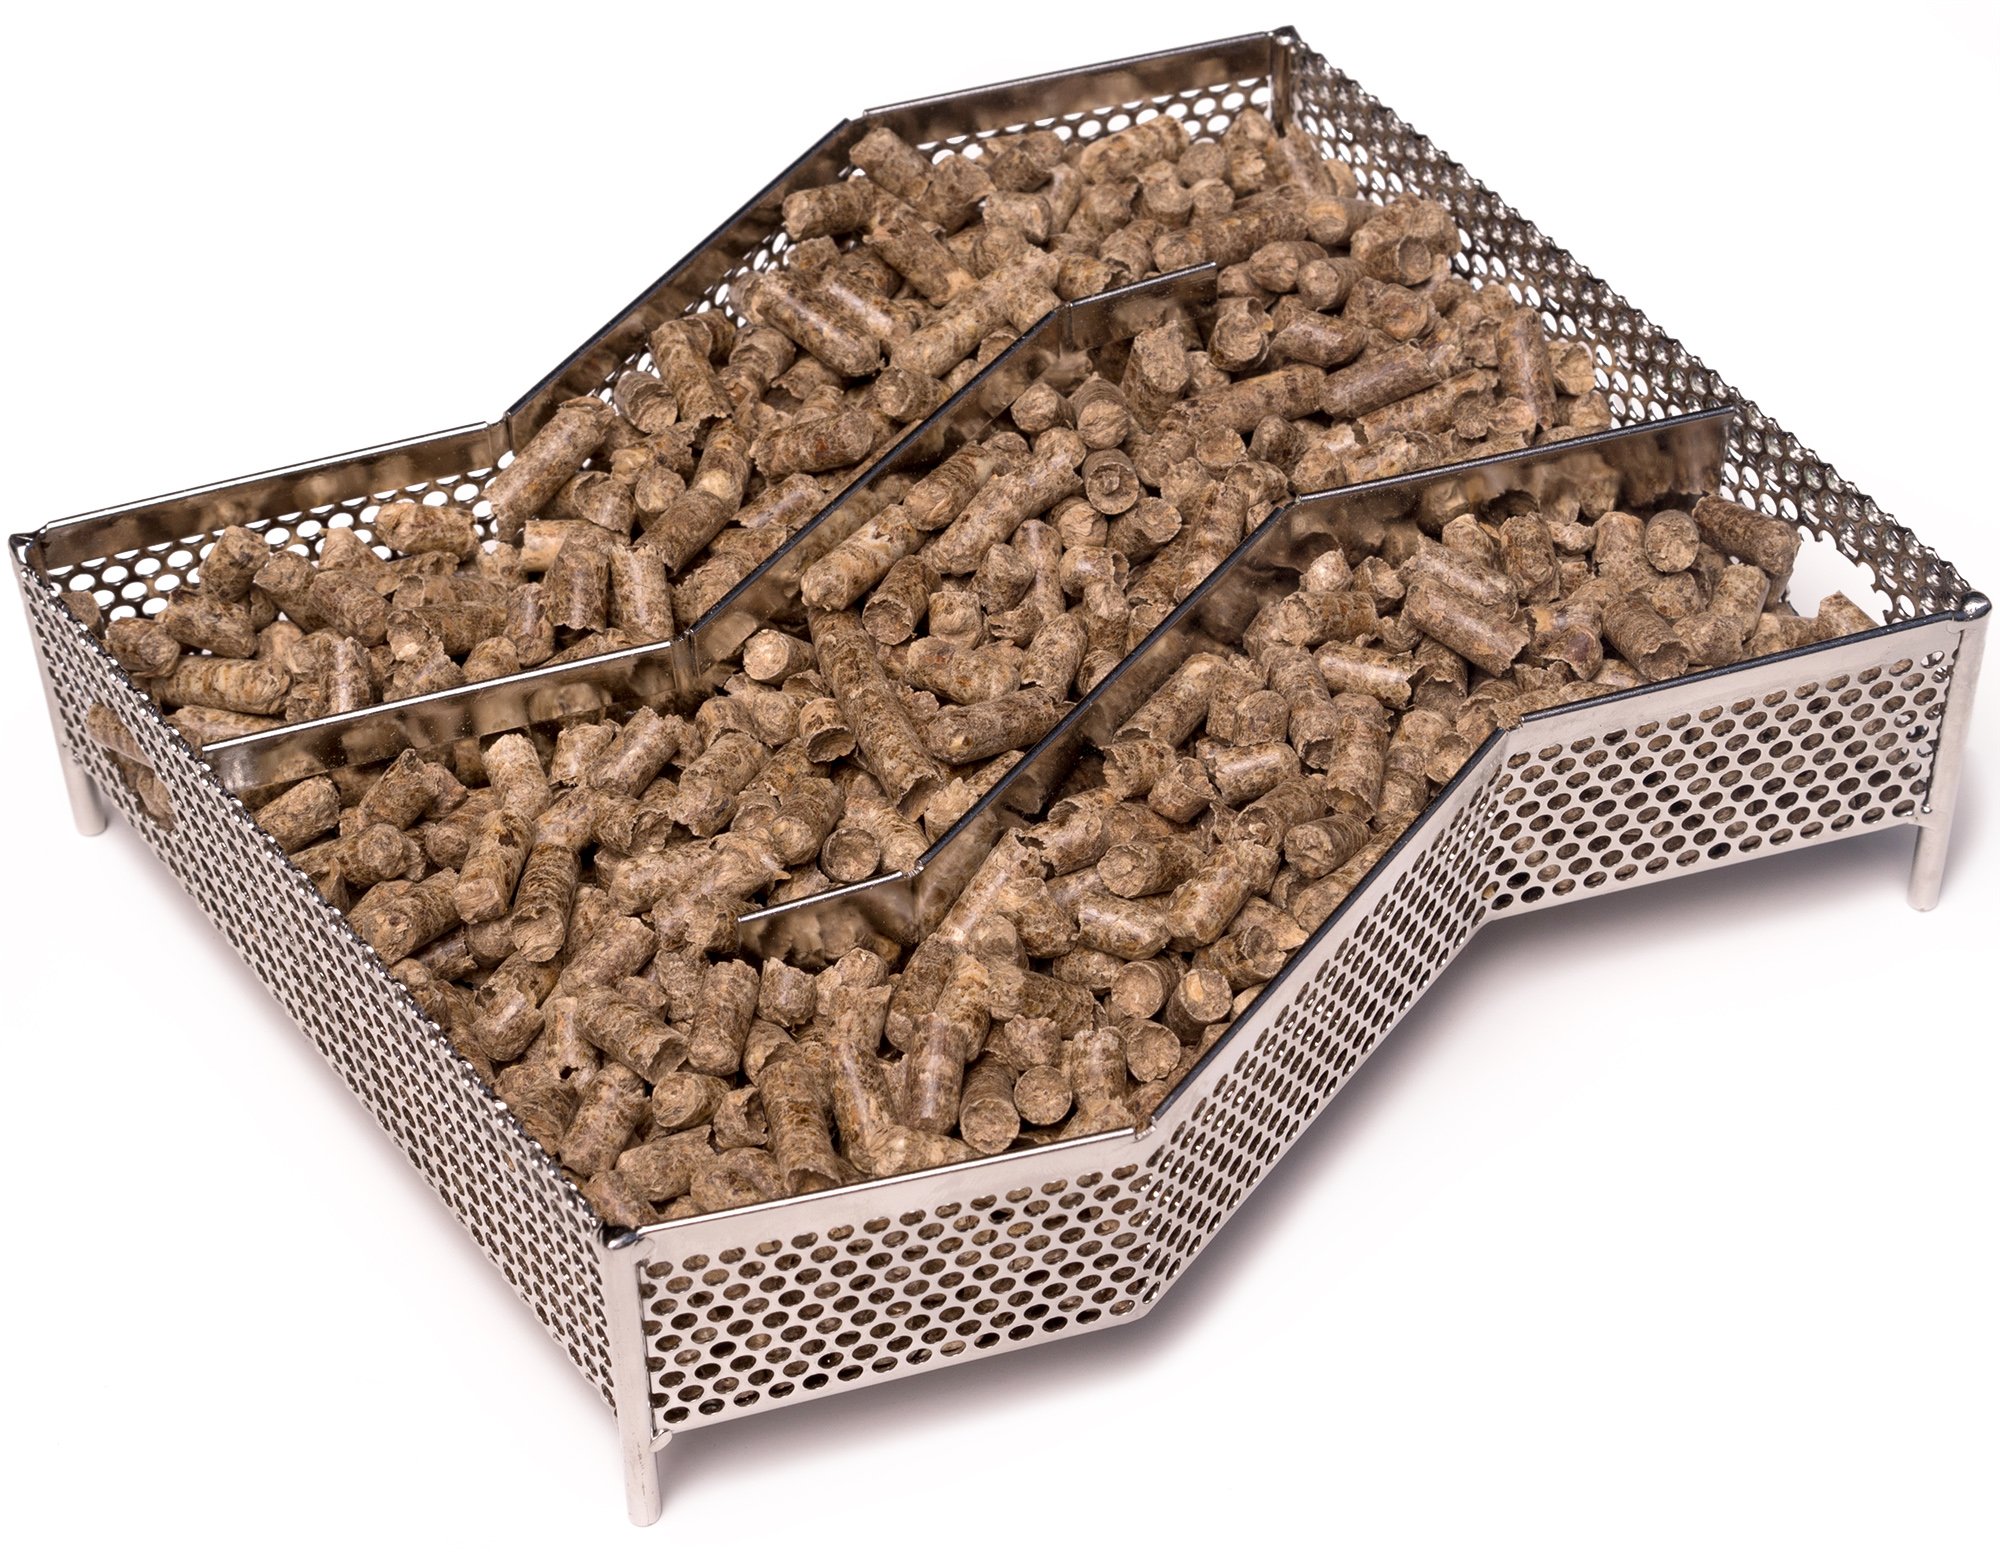 Kenley Wood Pellet Smoker - Cold Smoke Generator Box for ...